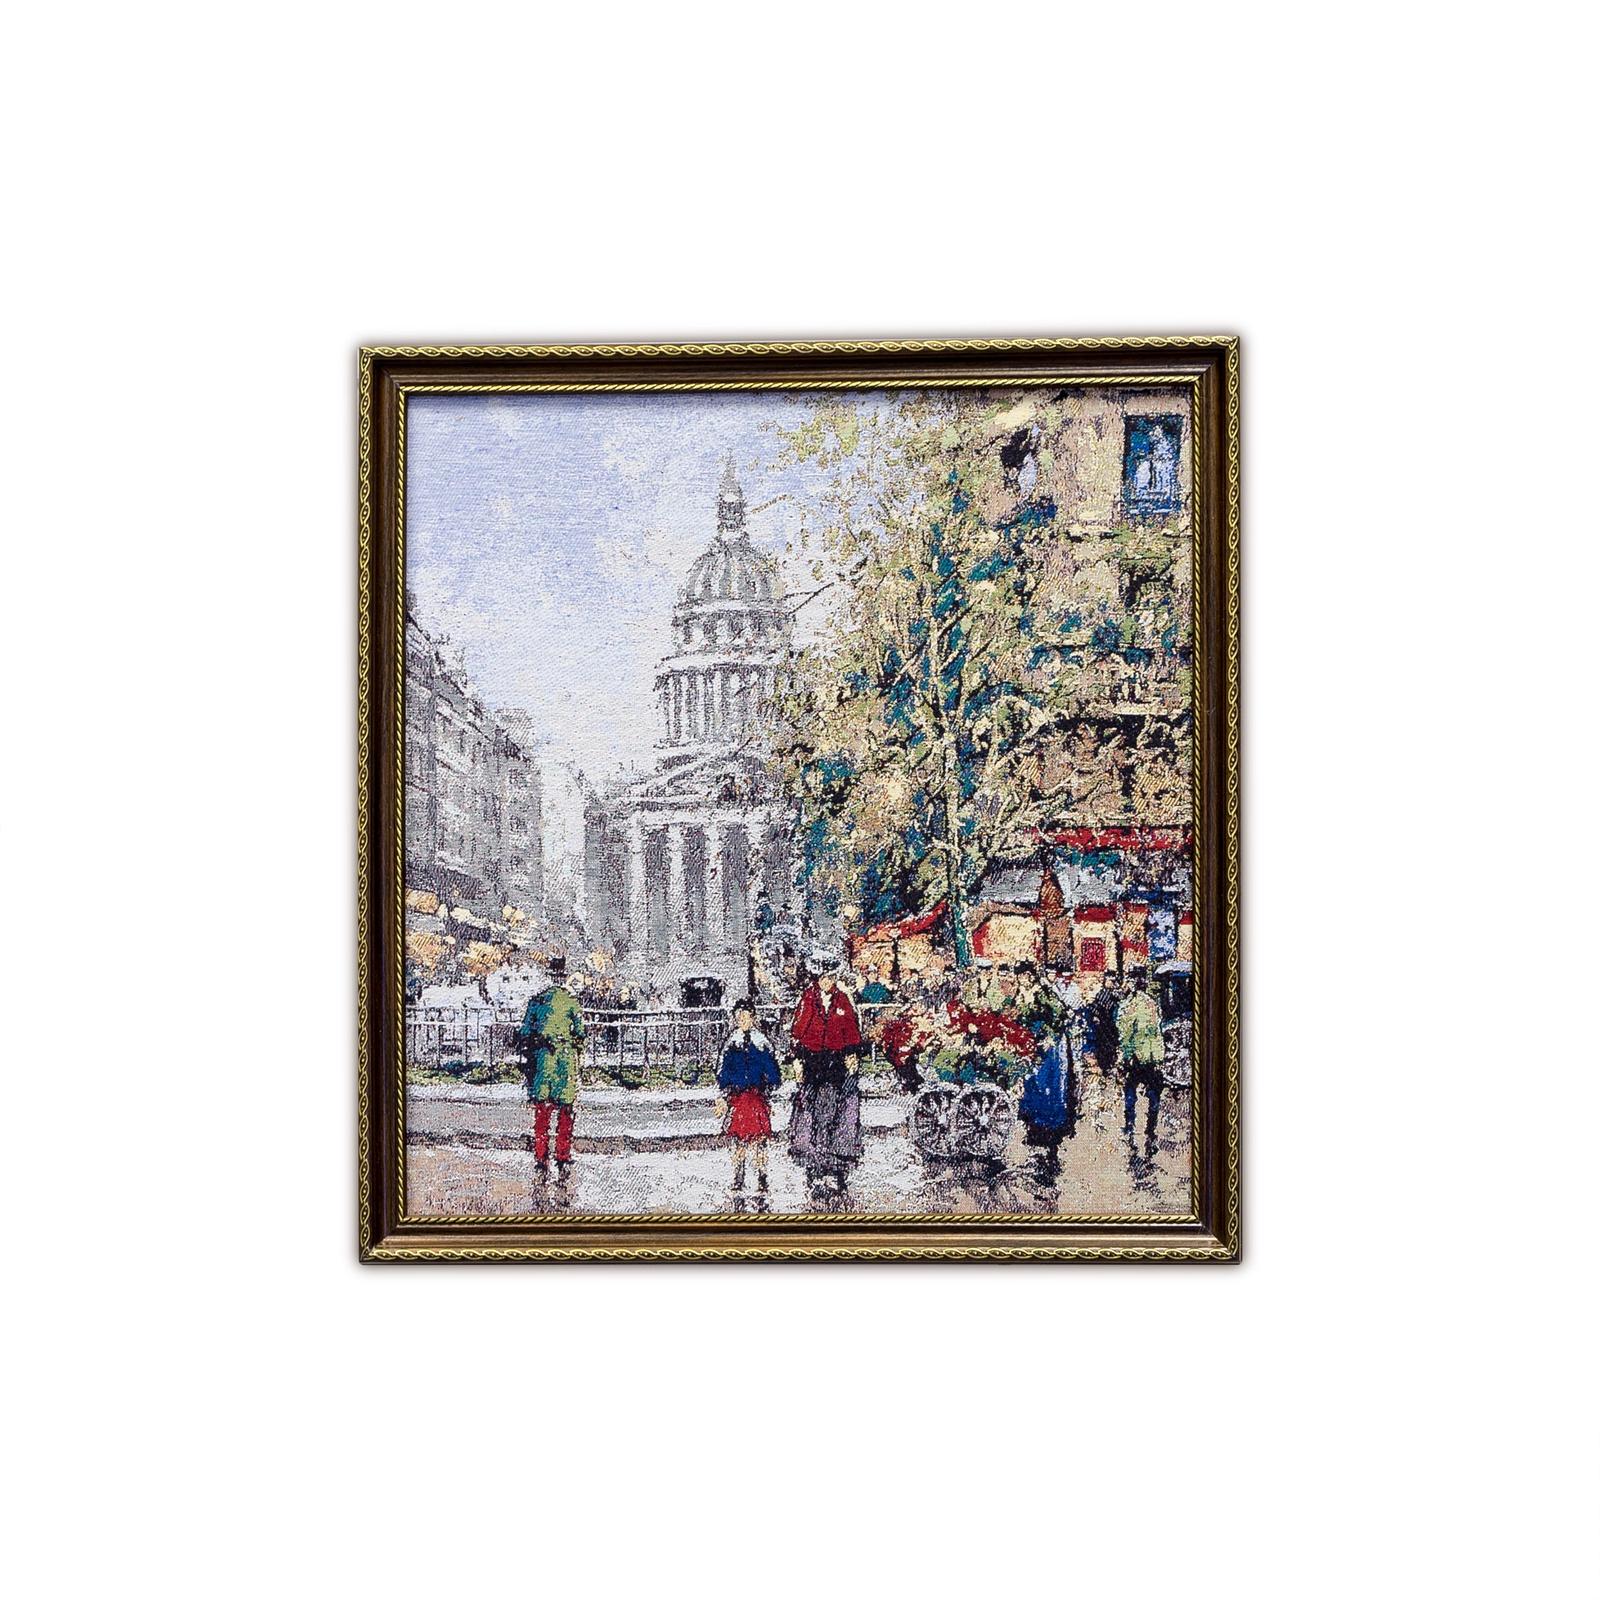 Картина Магазин гобеленов проспект 47*49 см, Гобелен